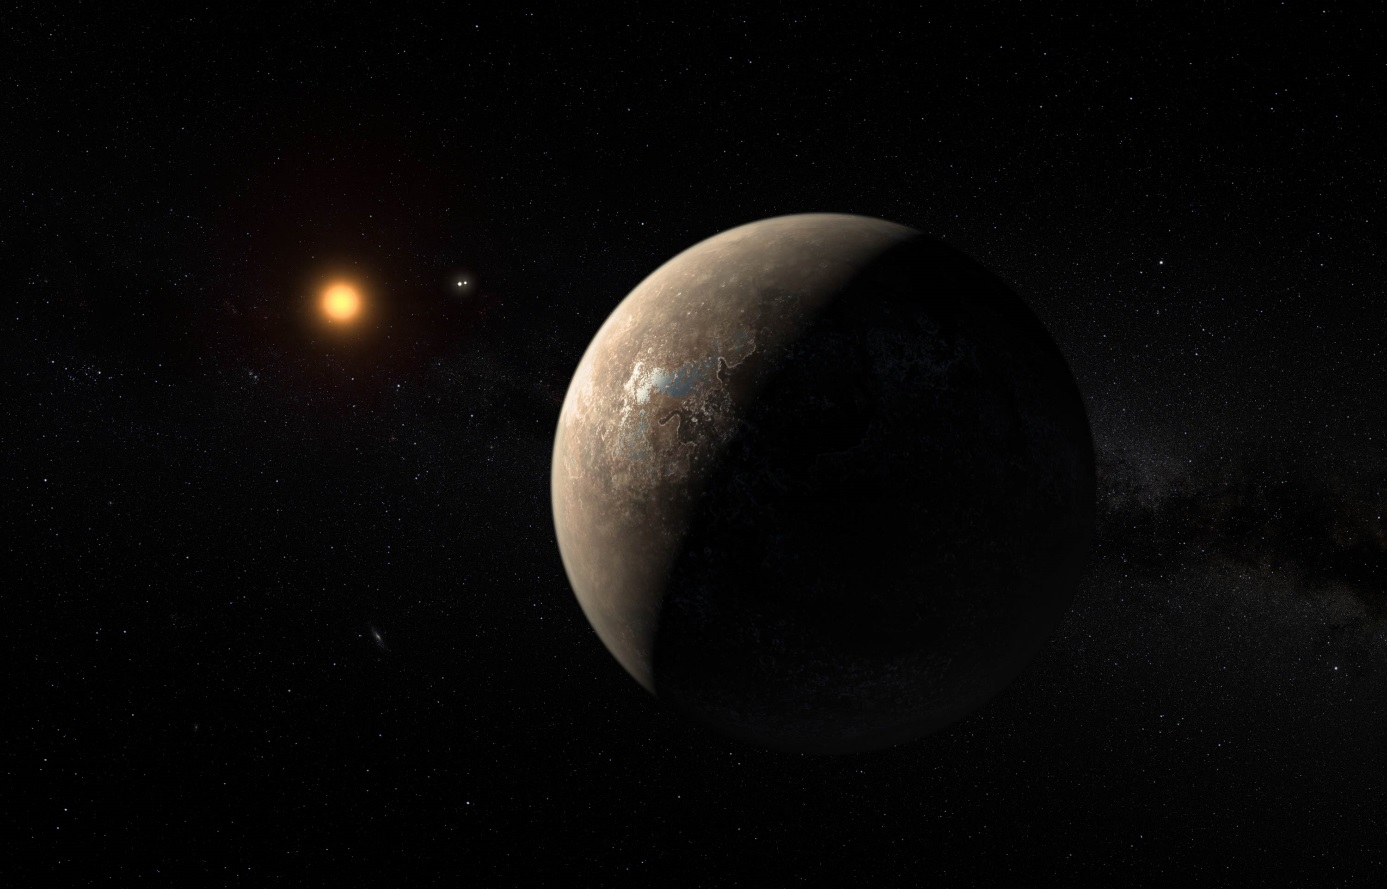 Exoplaneta Proxima Centauri b v uměleckých představách, Systém Alfa Centauri AB je kousek nalevo od Proximy Centauri (zdroj ESO, M. Kornmesser).